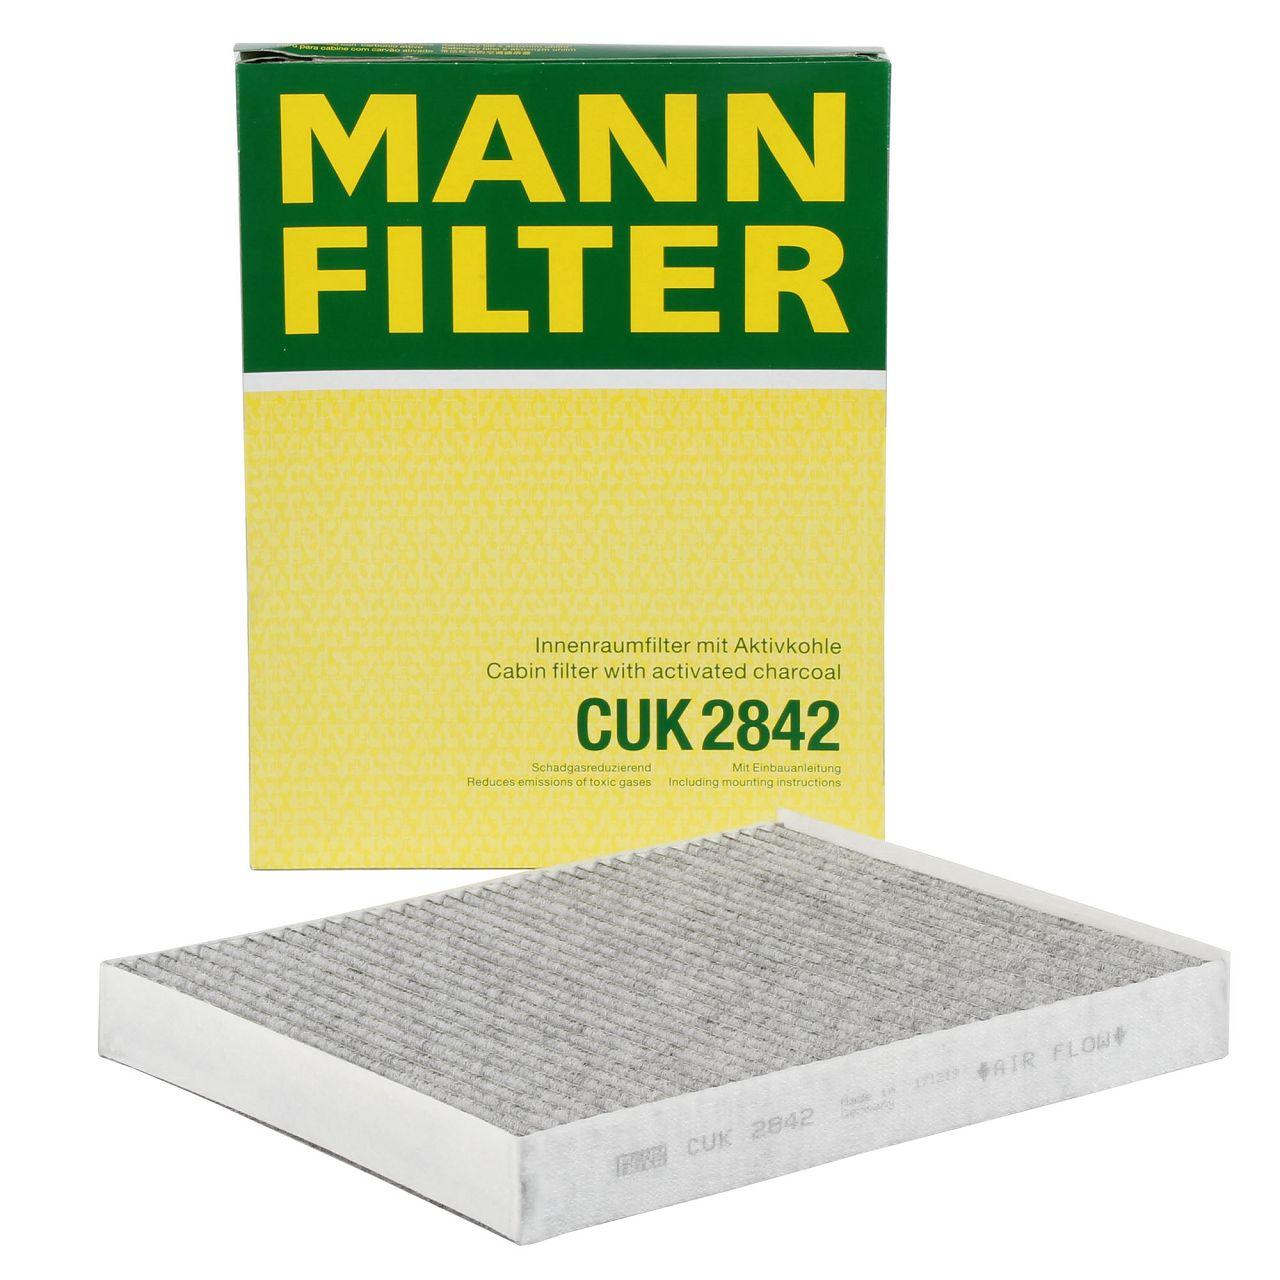 MANN Innenraumfilter Aktivkohlefilter für AUDI Q7 PORSCHE CAYENNE VW TOUAREG